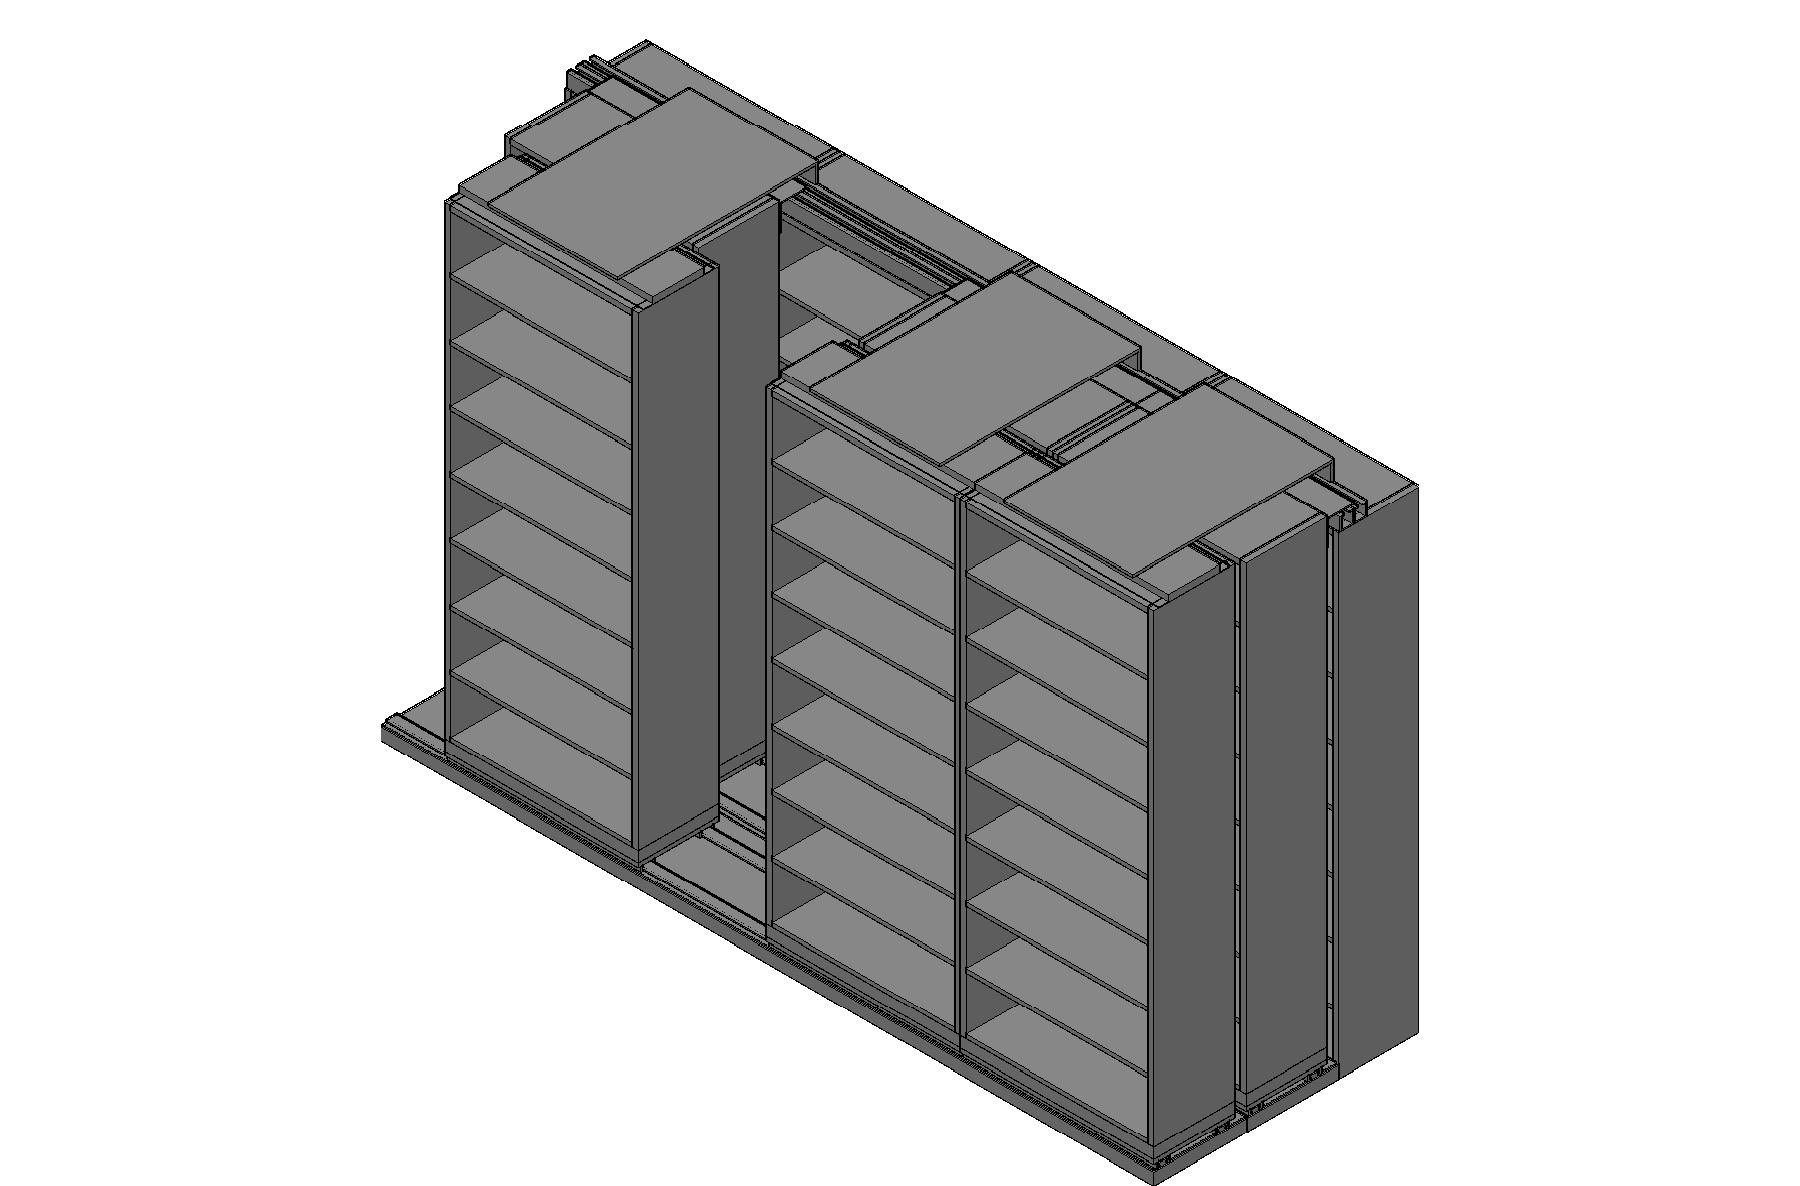 "Legal Size Sliding Shelves - 3 Rows Deep - 8 Levels - (36"" x 15"" Shelves) - 148"" Total Width"